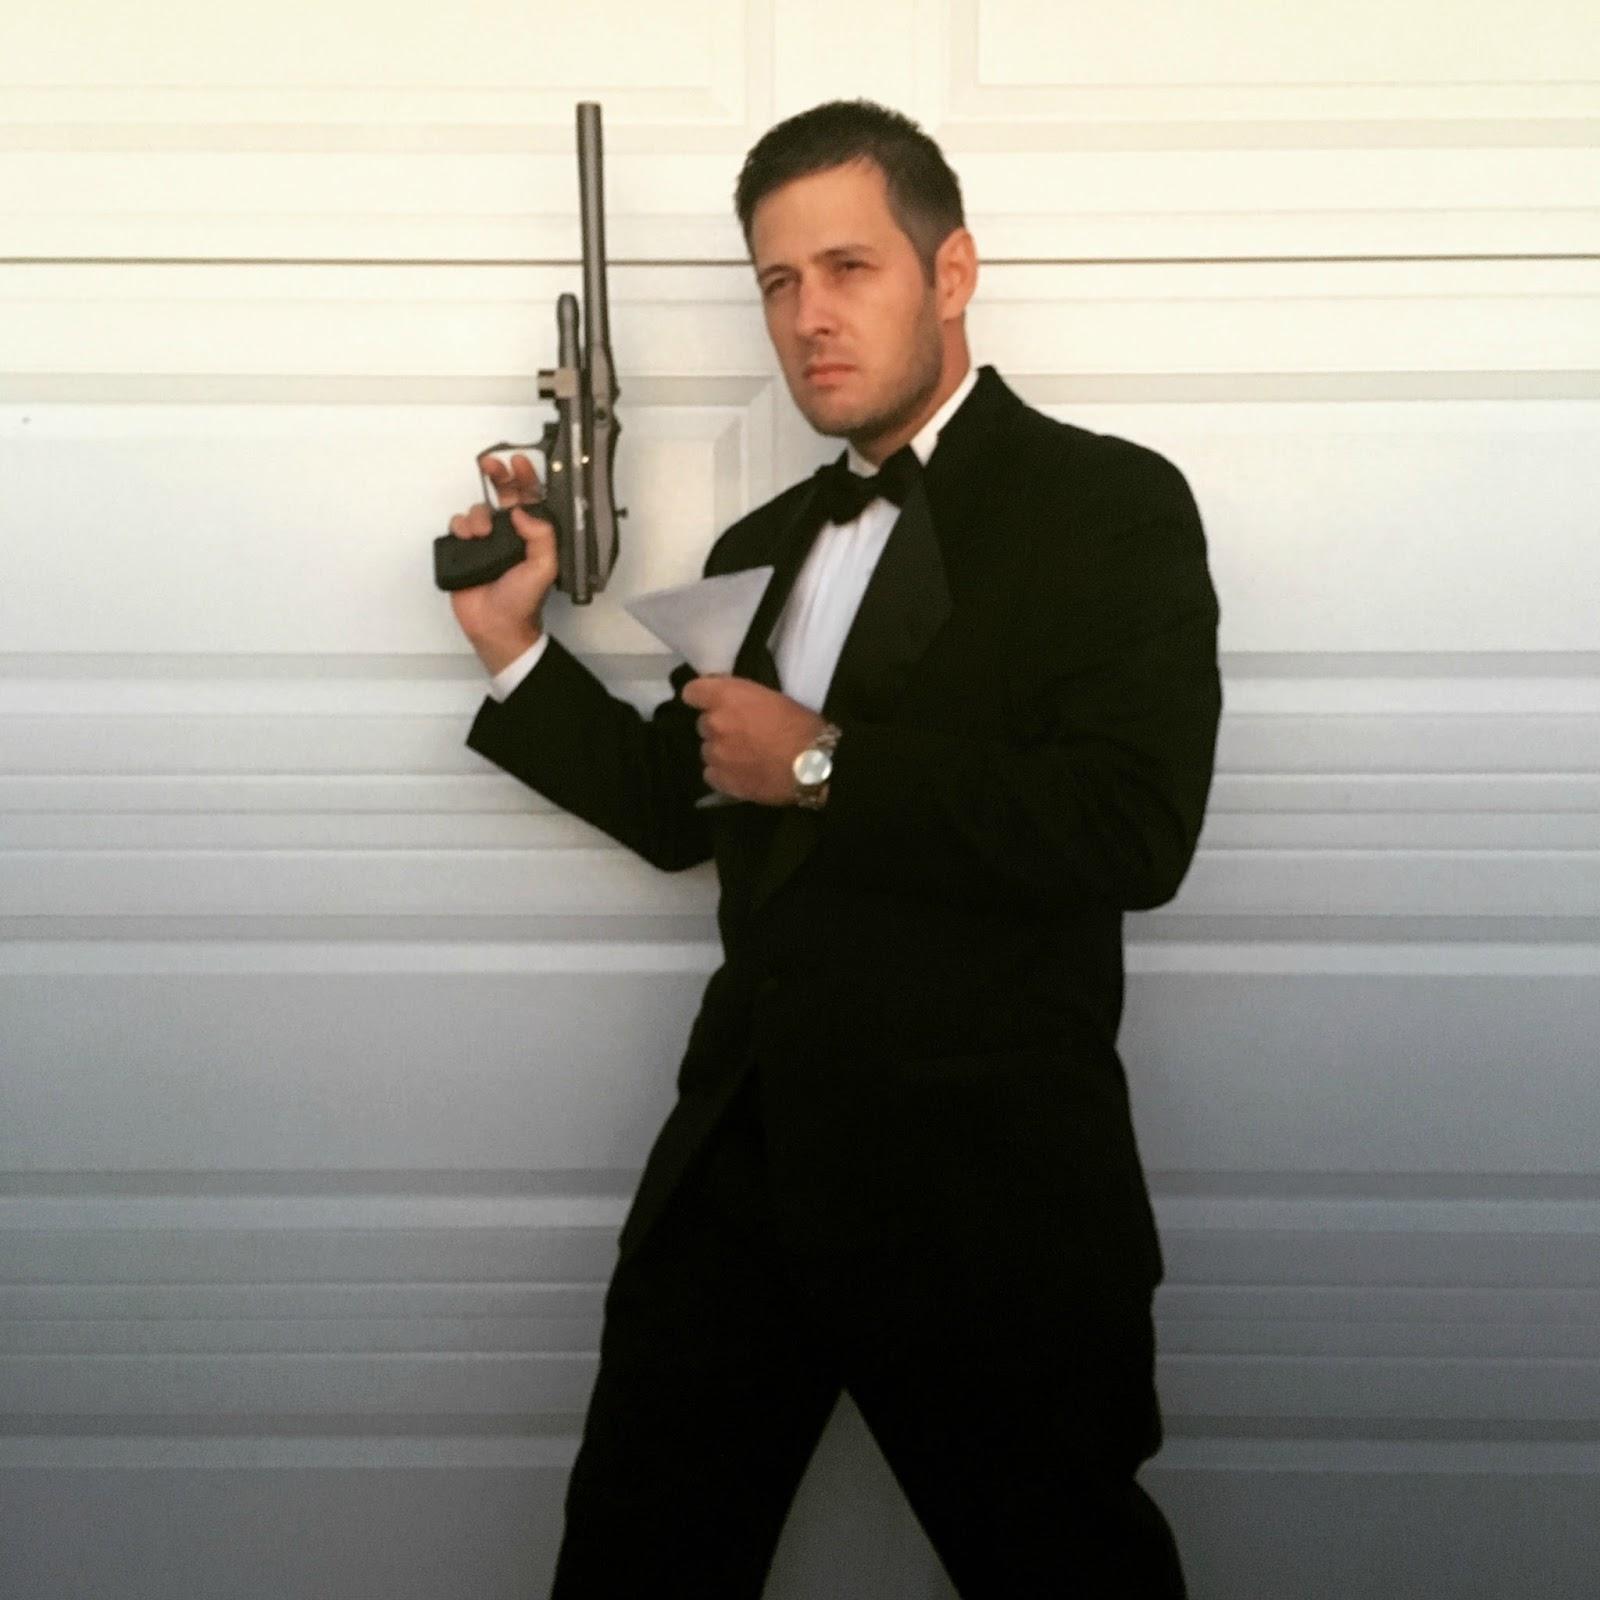 Pepper express - James bond costume ...